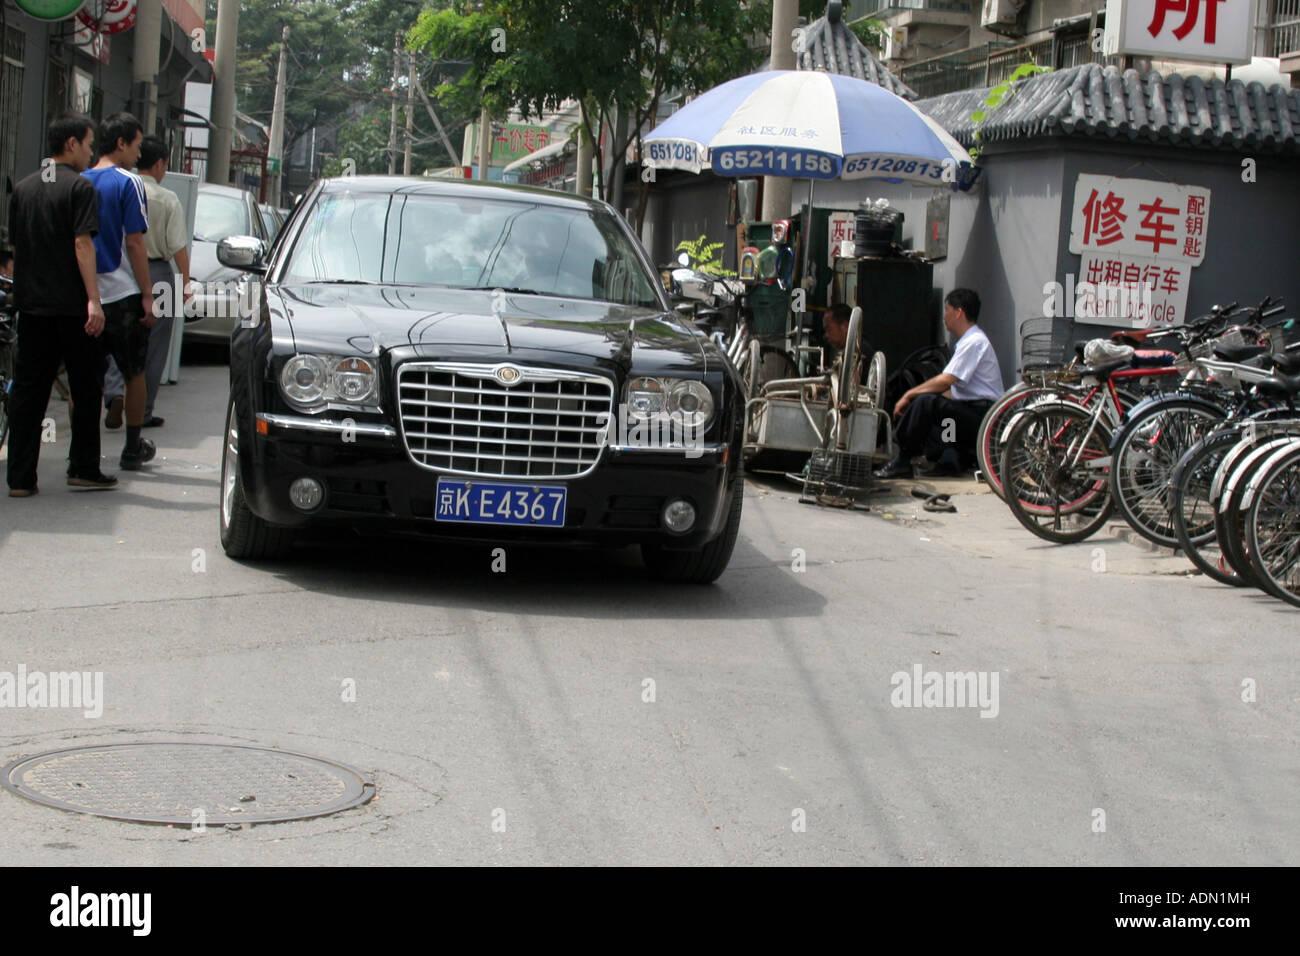 Coche de lujo en la calle angosta de China Beijing Hutong Agosto de 2007 Foto de stock